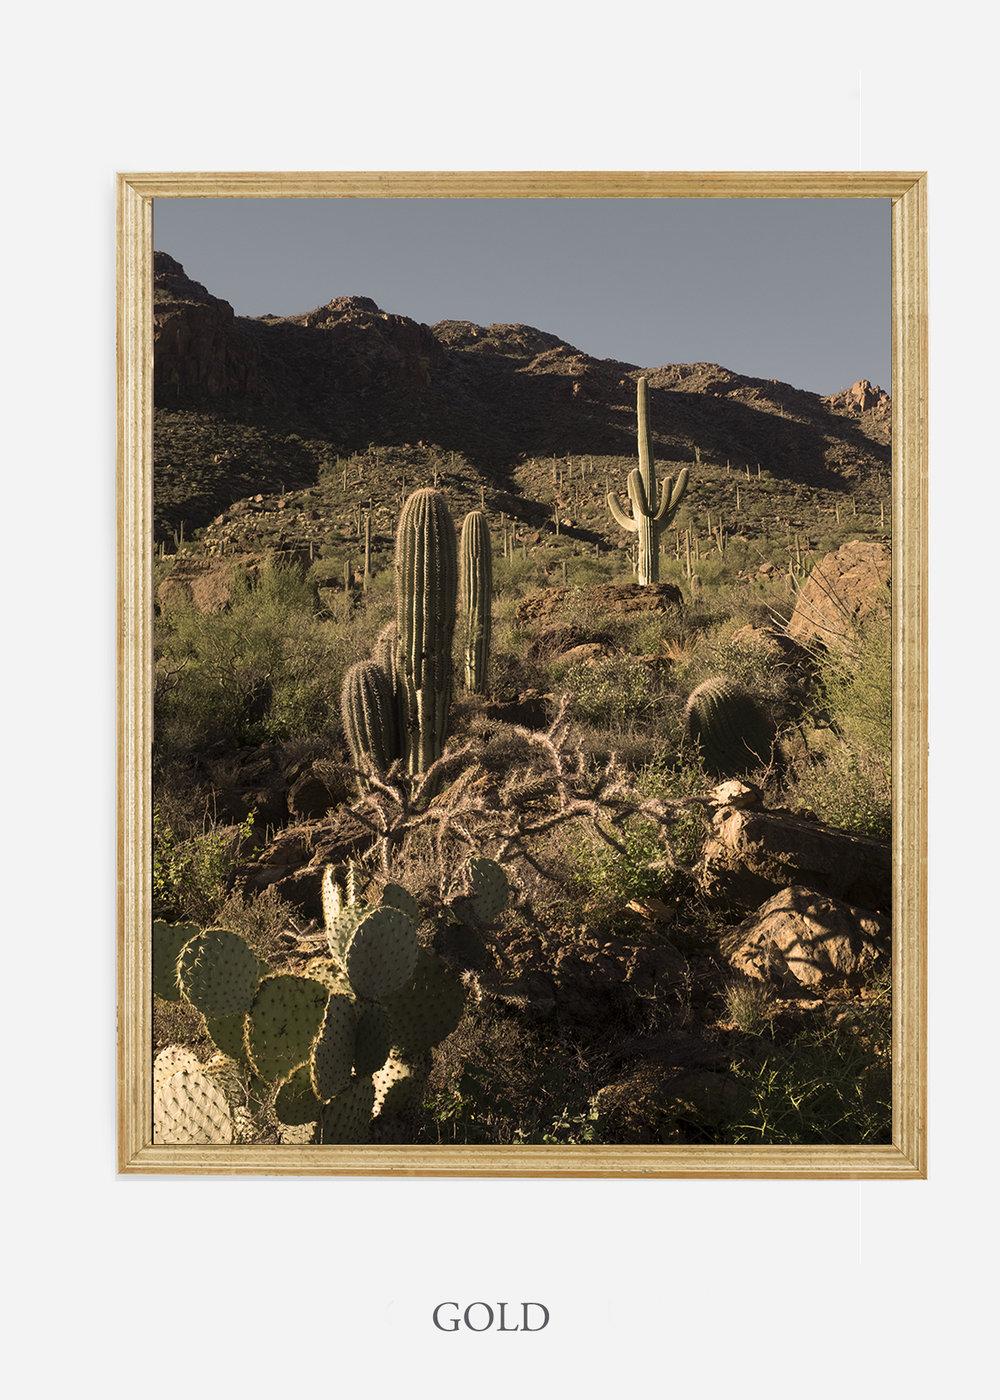 nomat-goldframe-saguaroNo.18-wildercalifornia-art-wallart-cactusprint-homedecor-prints-arizona-botanical-artwork-interiordesign.jpg